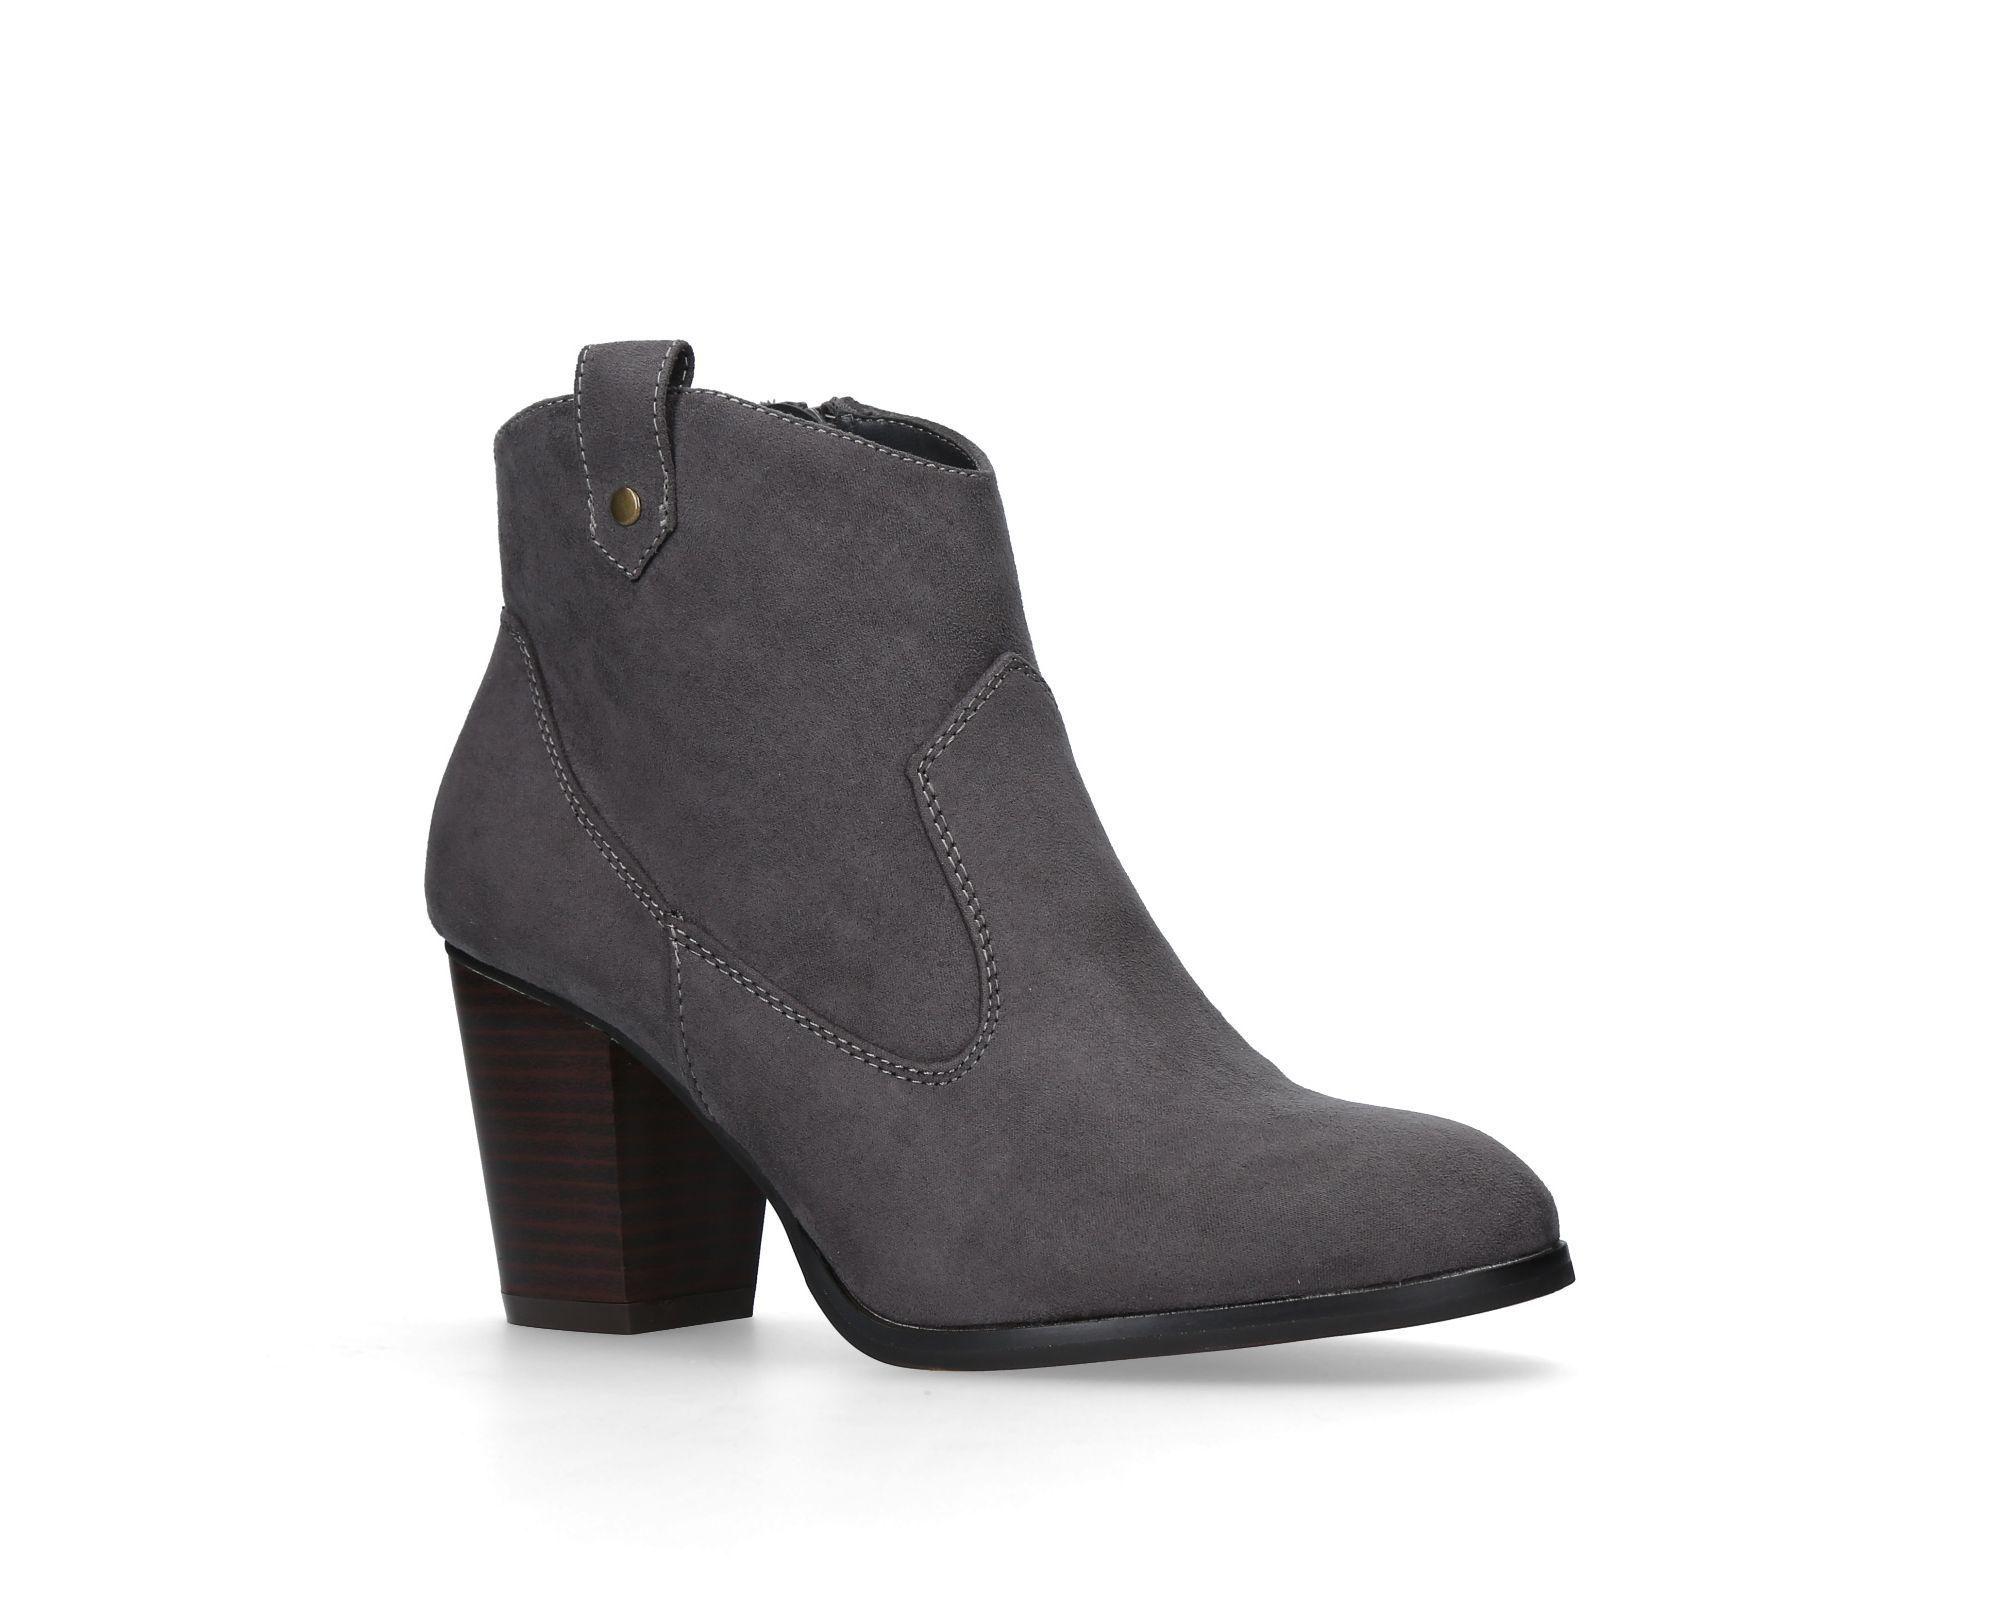 KG Saloon mid block heel ankle boots, Tan   Boots, Tan